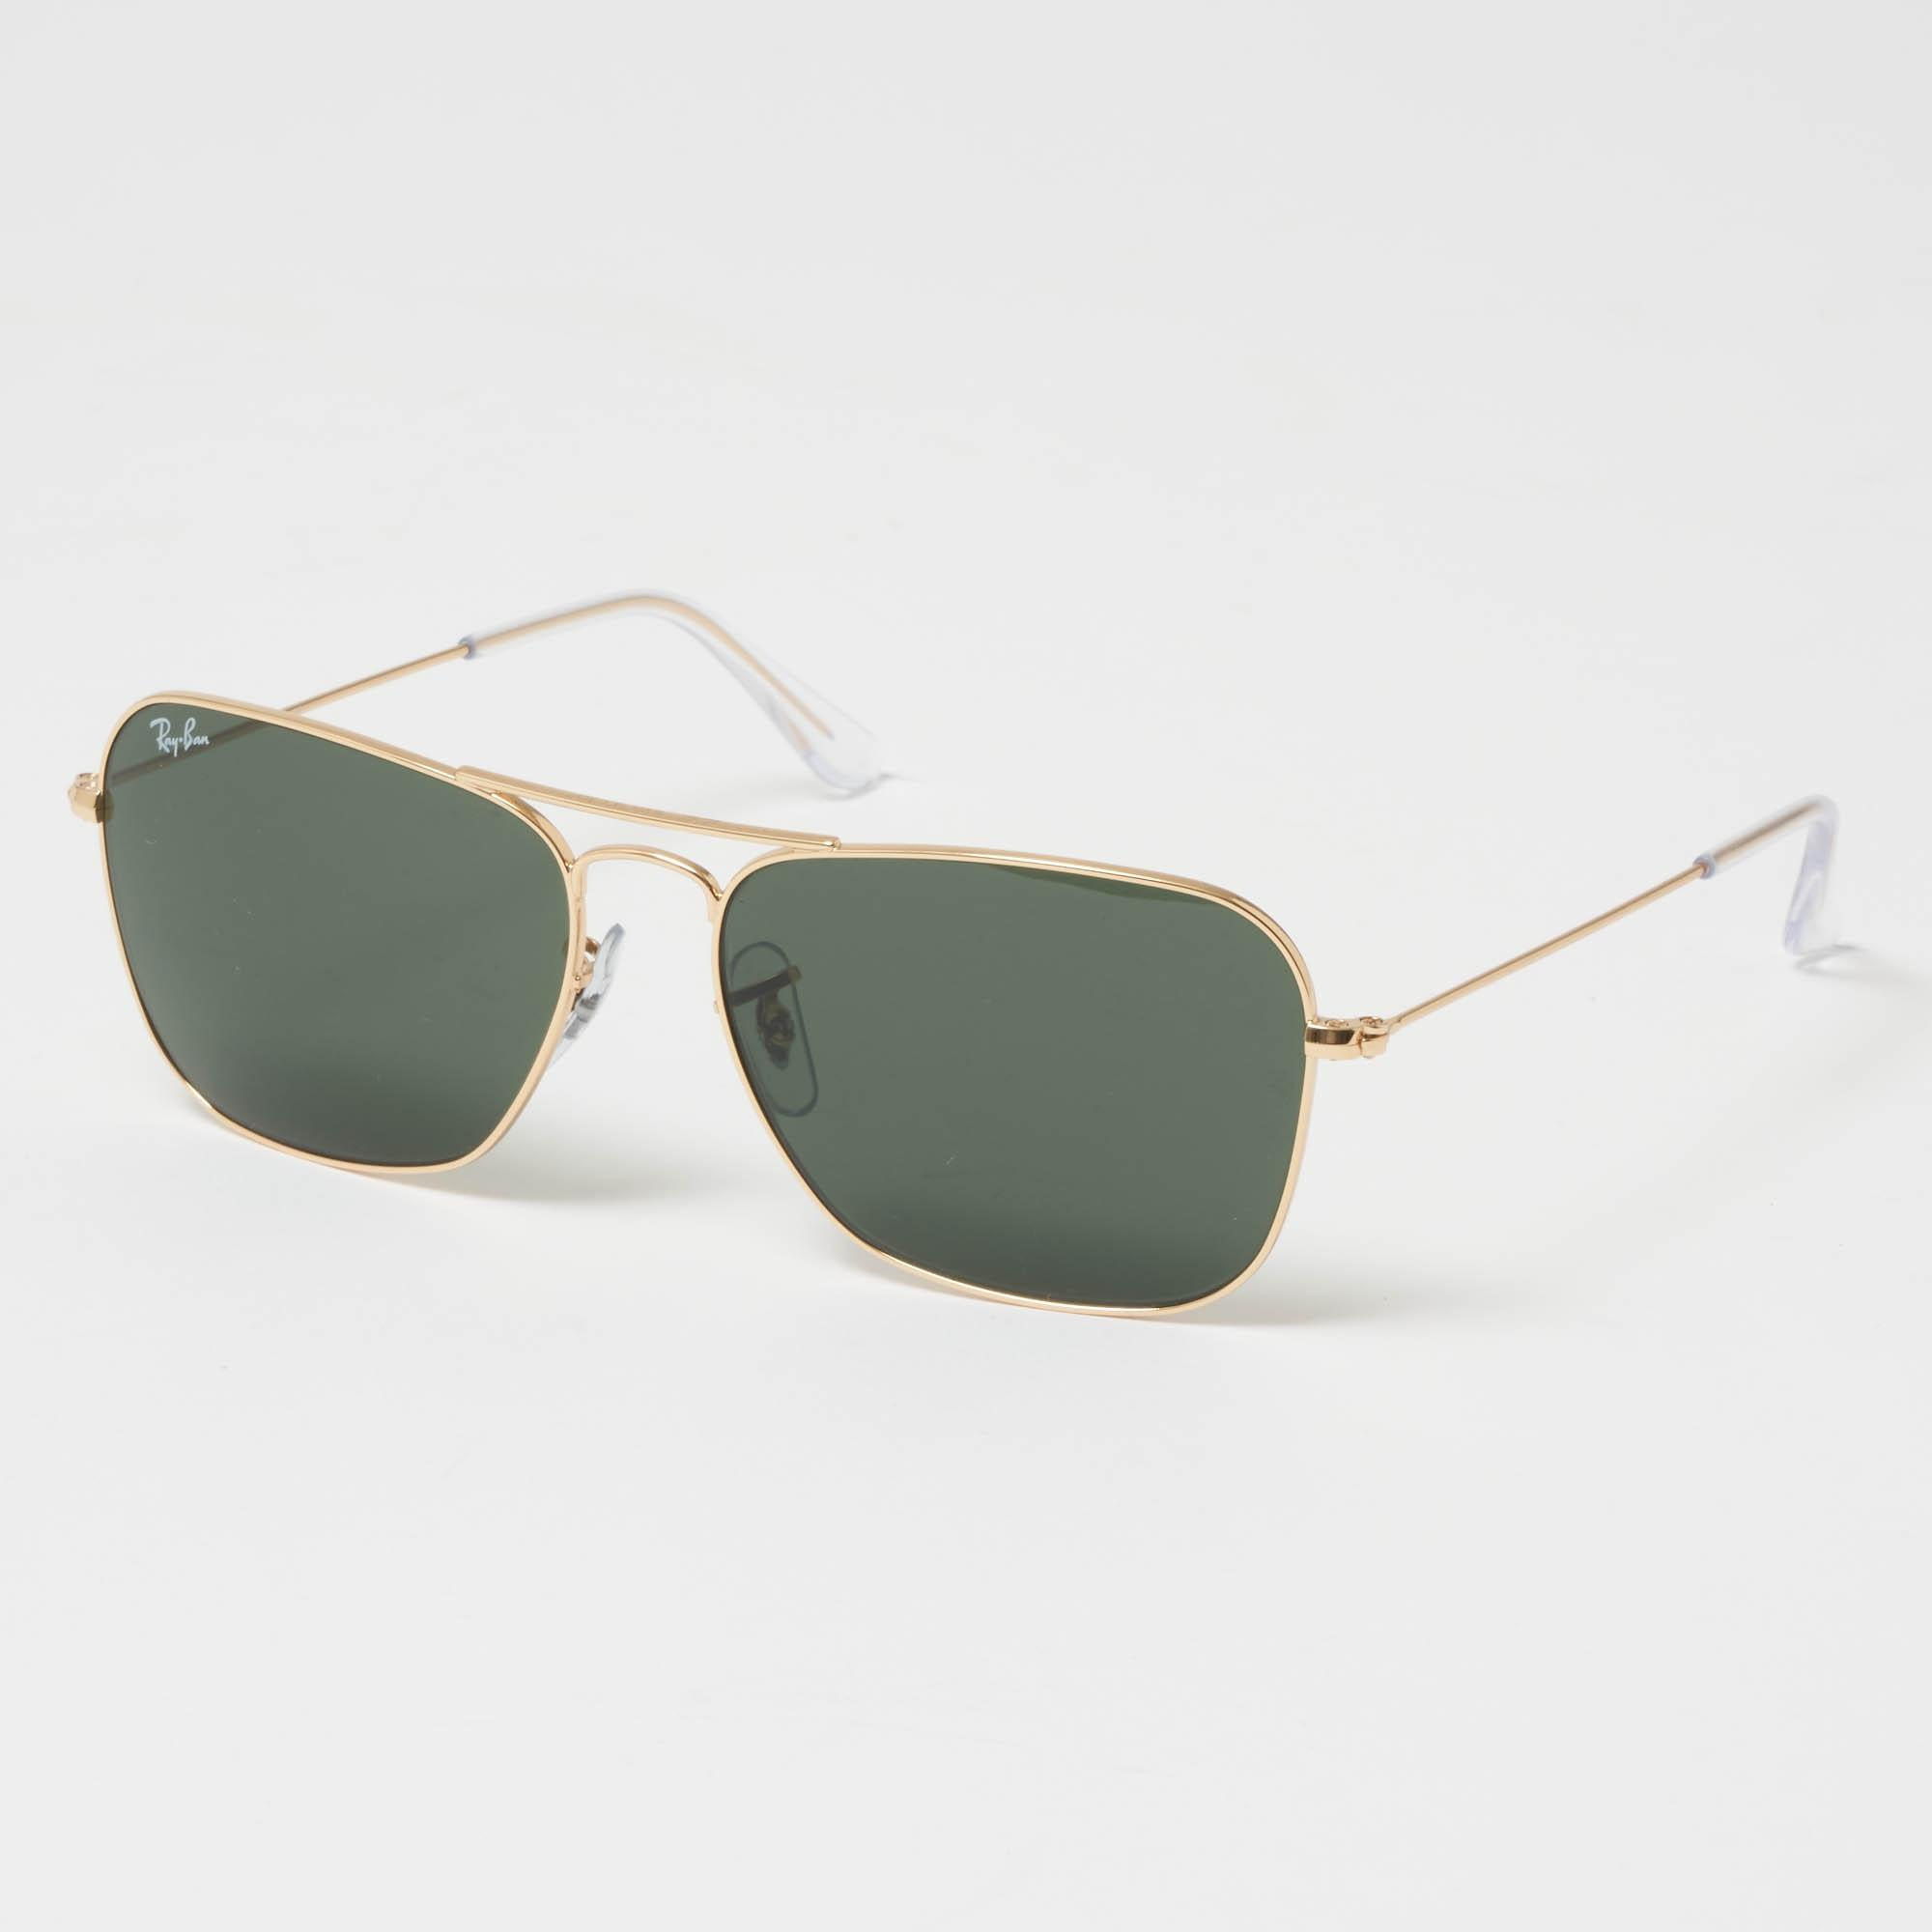 9f47dc2a1f Lyst - Ray-Ban Caravan Sunglasses - Green Classic G-15 Lenses in ...